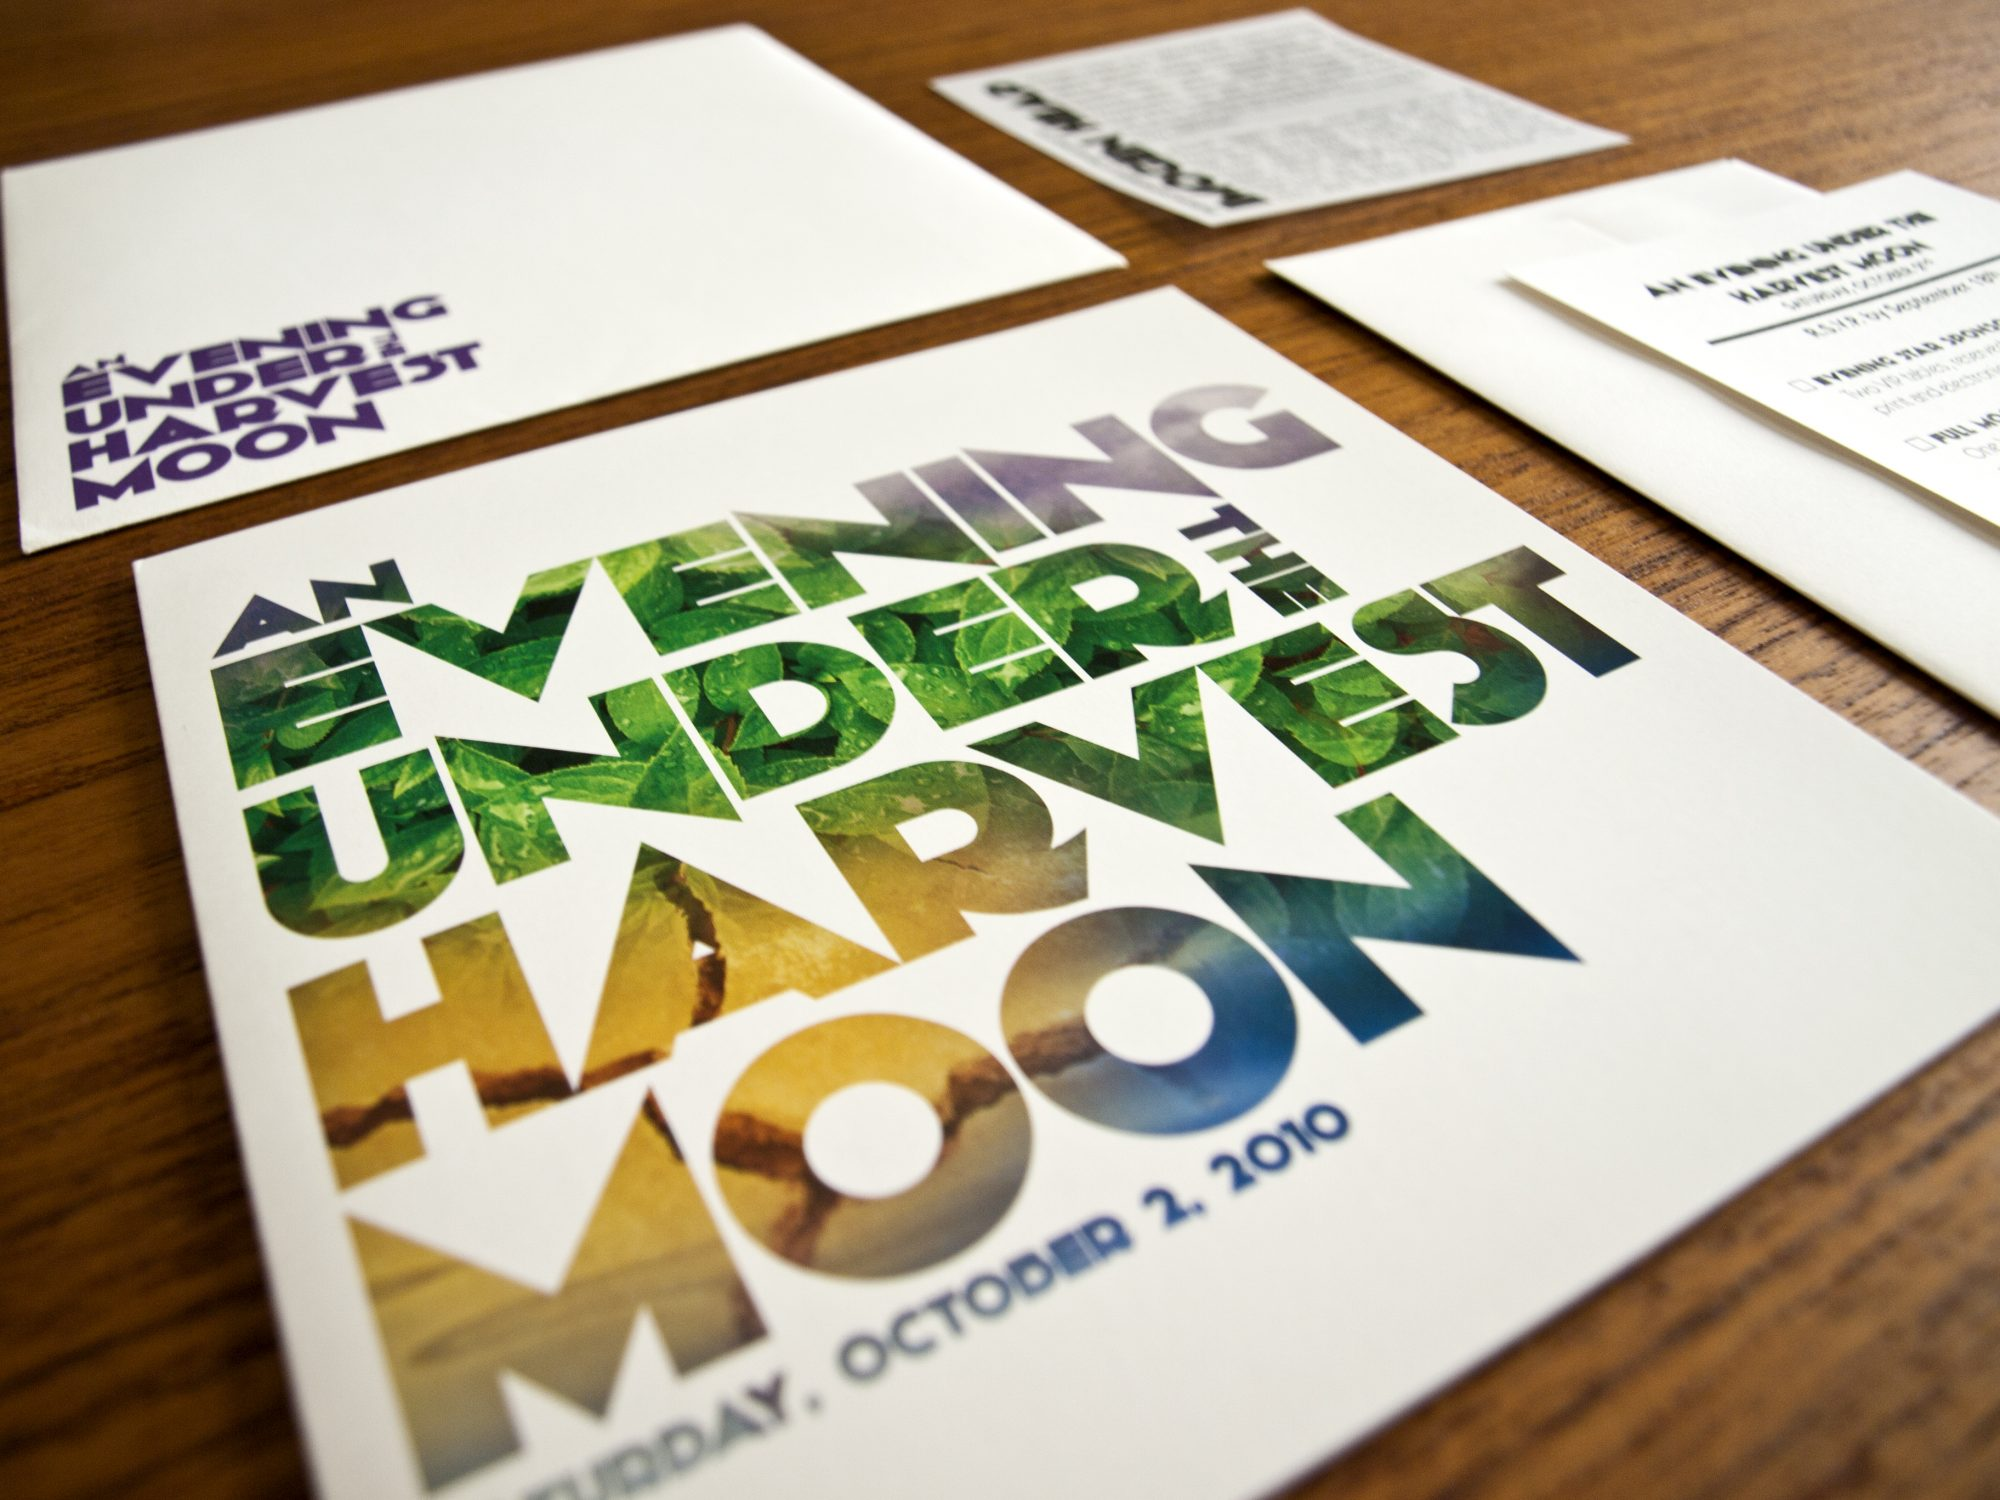 An Evening Under the Harvest Moon: Envelope, Invitation, RSVP Card, and Vellum Insert